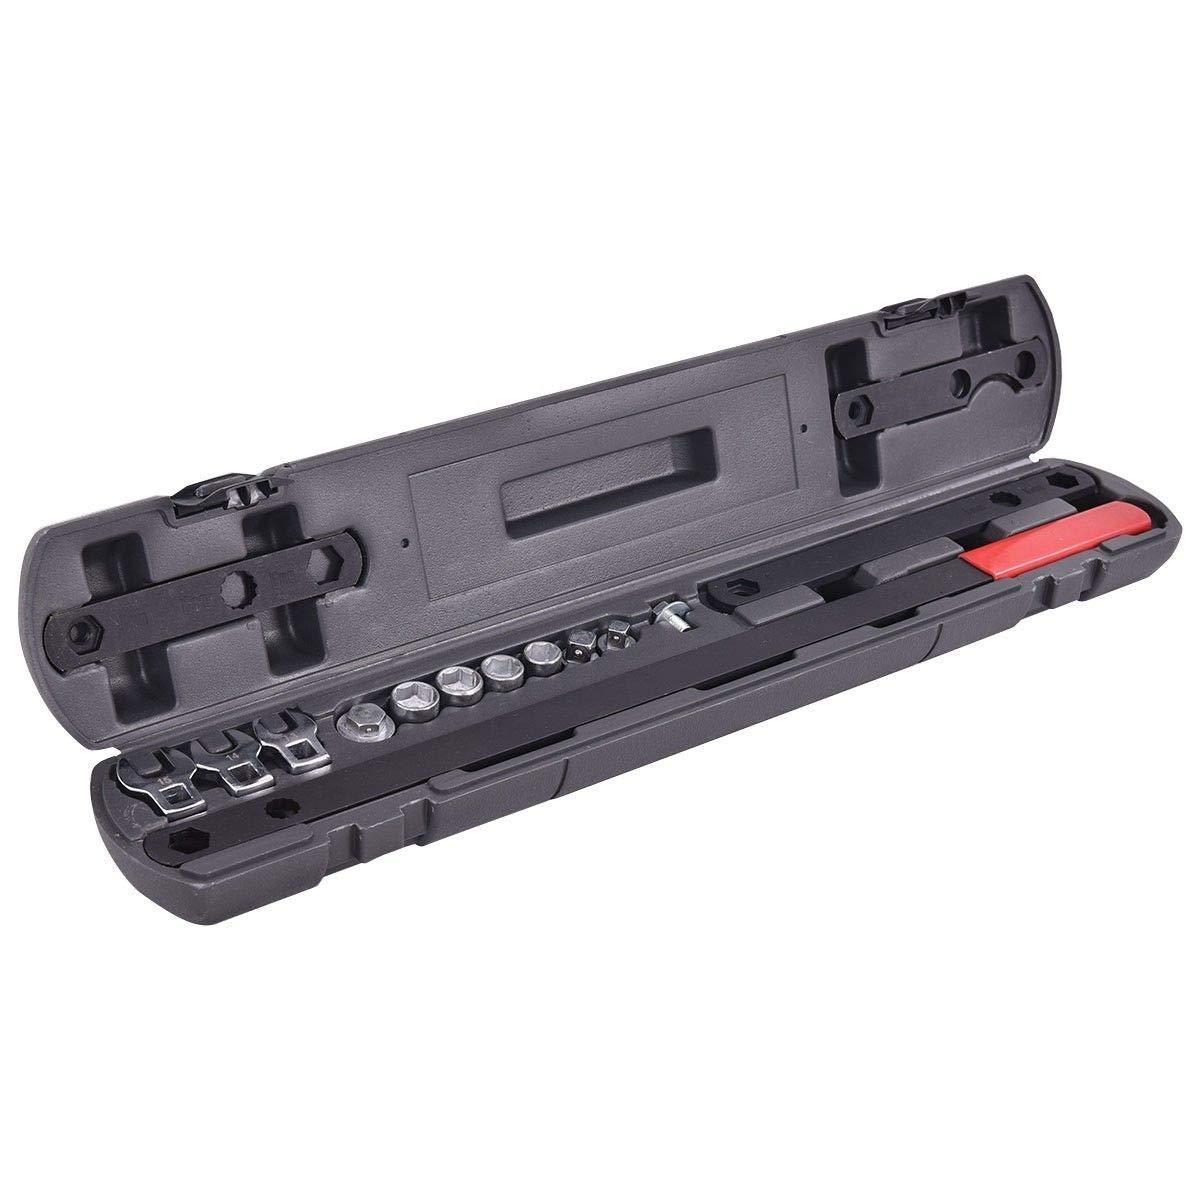 16 pcs Wrench Serpentine Belt Tool Kit Automotive Repair Set Sockets Wrench Serpentine Belt Tool Kit BeUniqueToday